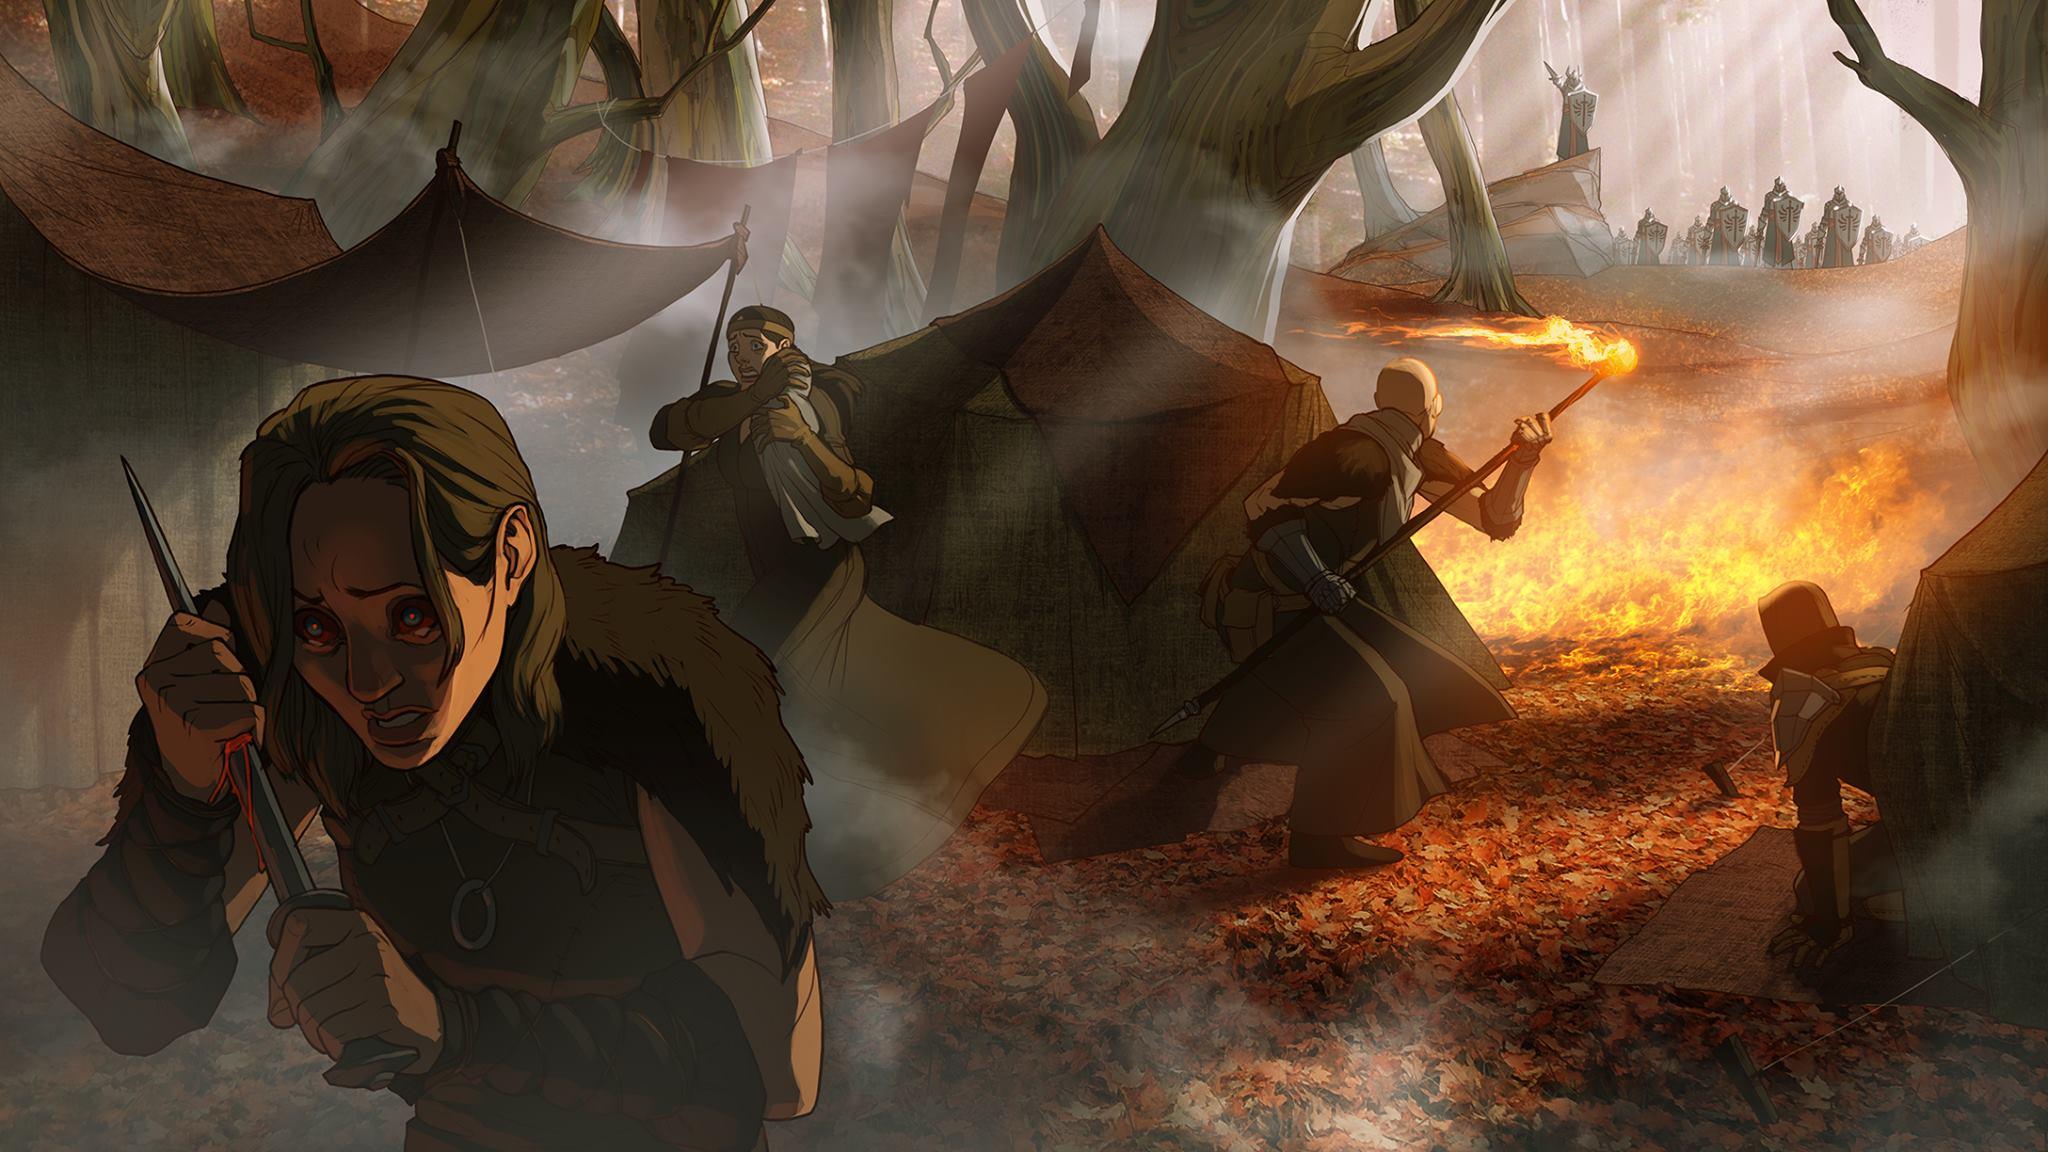 VengefulTemplar/Dragon Age: Inquisition - Neues Artwork